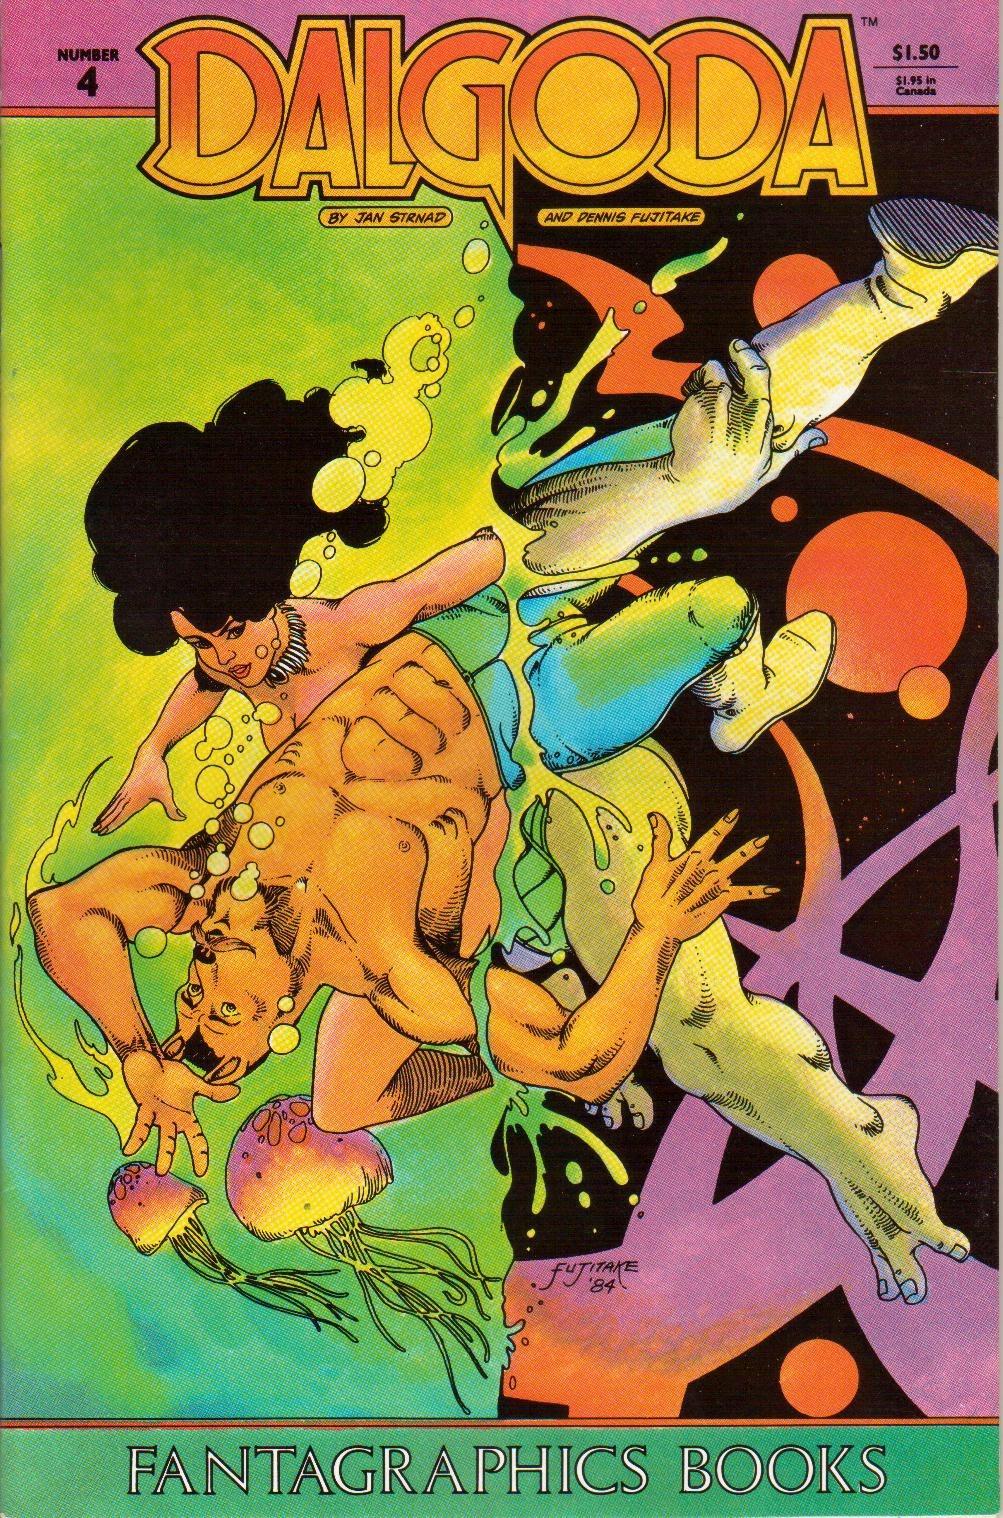 Read online Dalgoda comic -  Issue #4 - 1